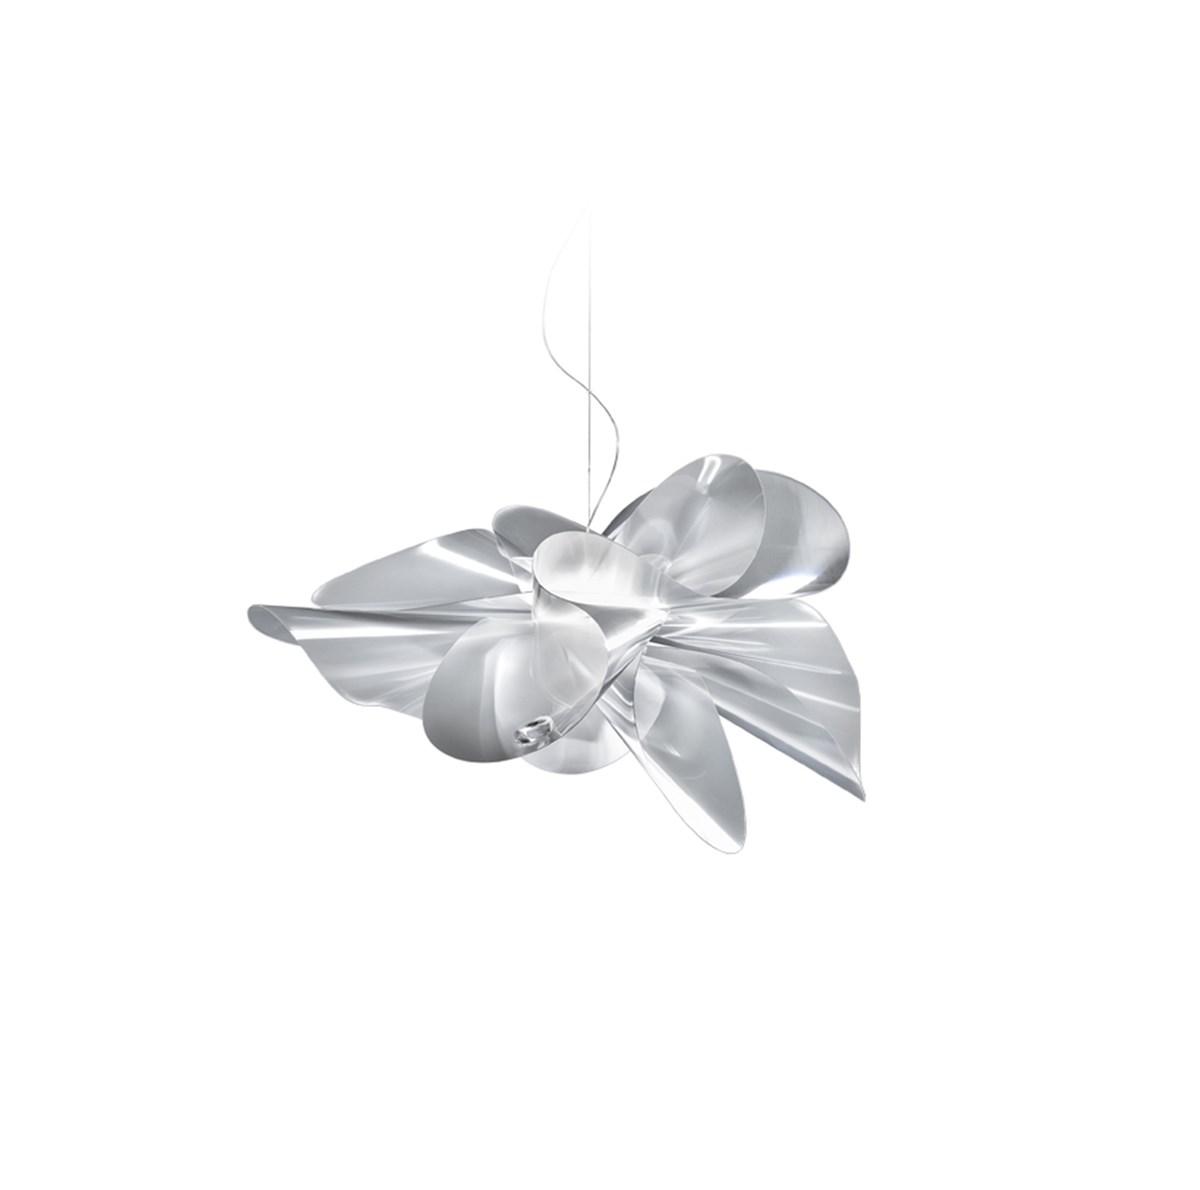 Slamp-Adriano-Rachele-Etoile-Pendant-Light-Matisse-1